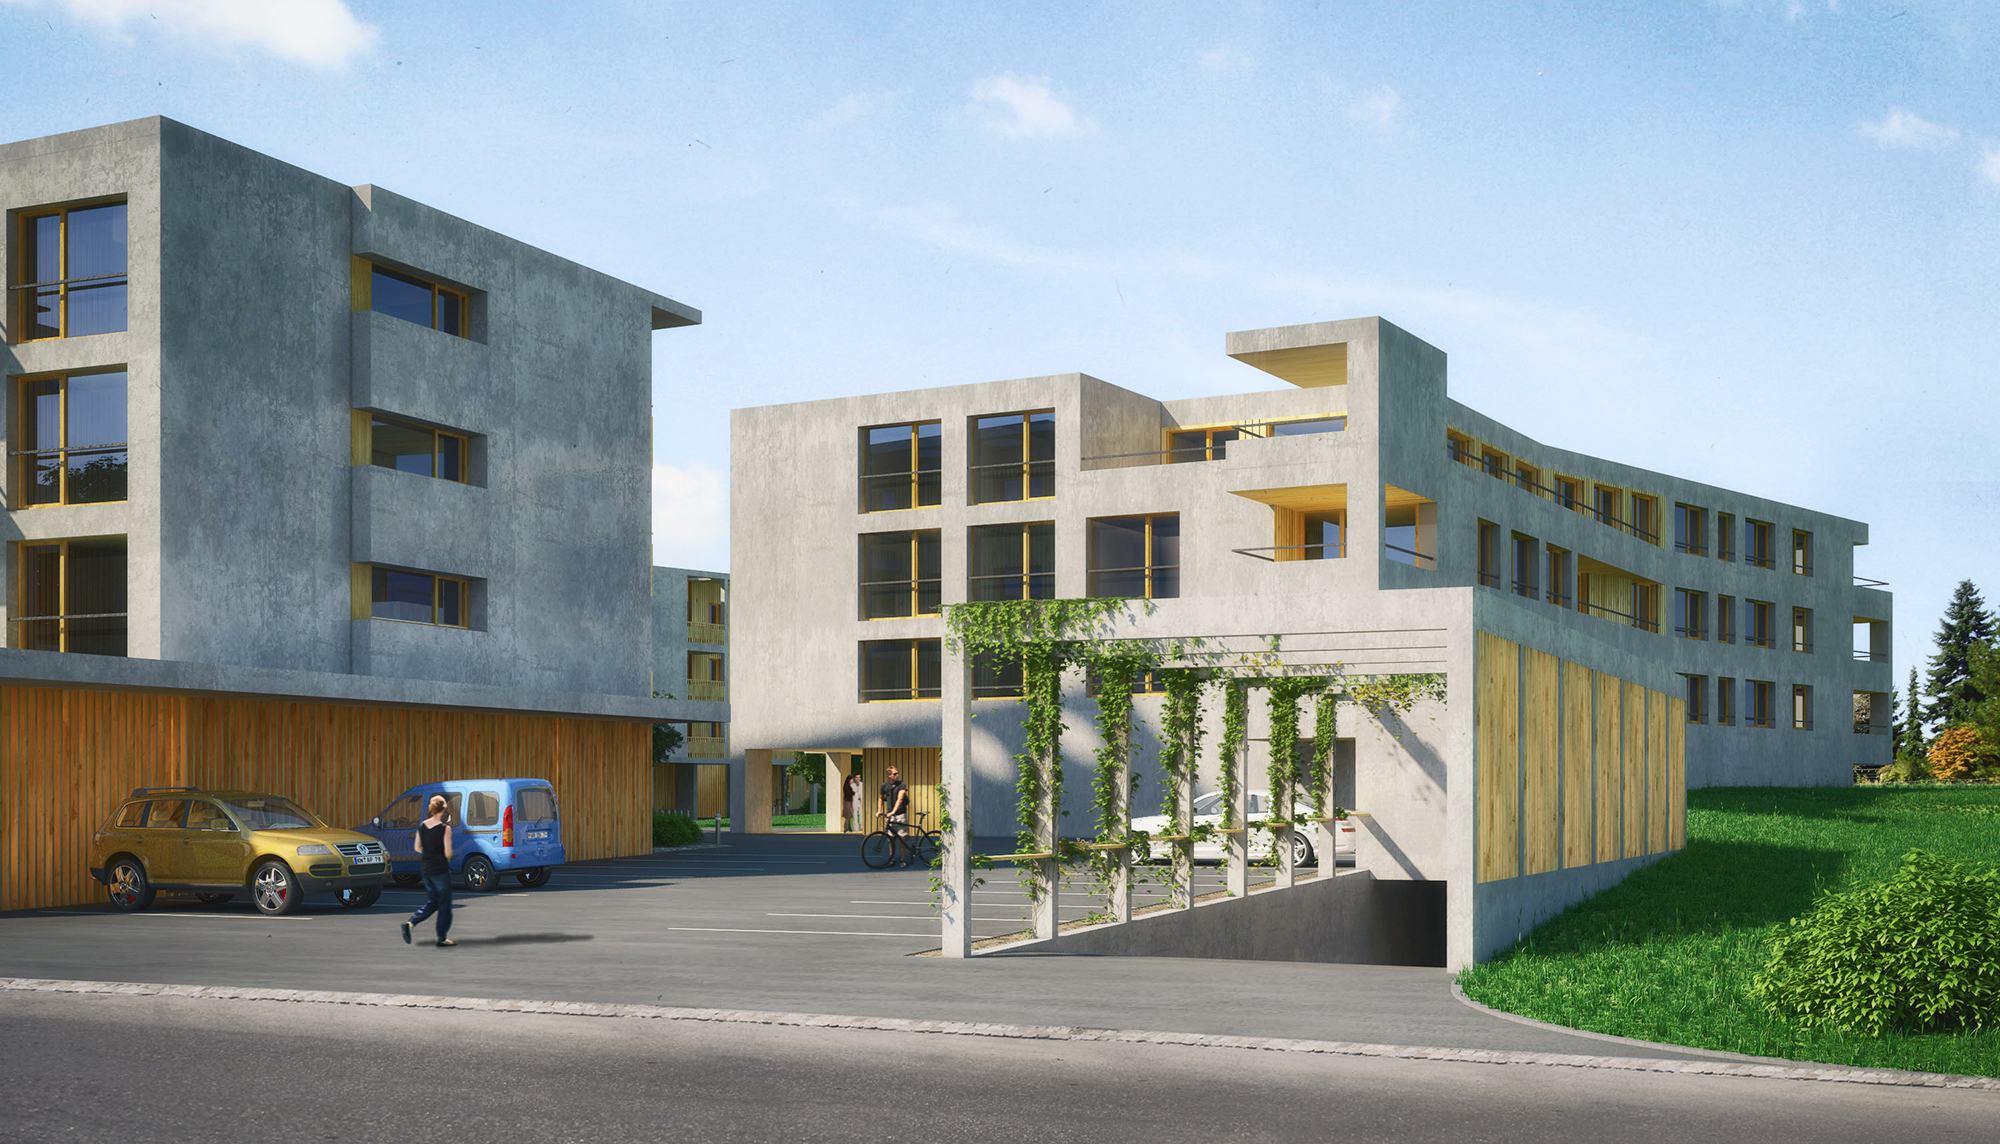 Anjana Perera Visualisierung - Wohnbebauung Sonnenfeld Air Architekten AG